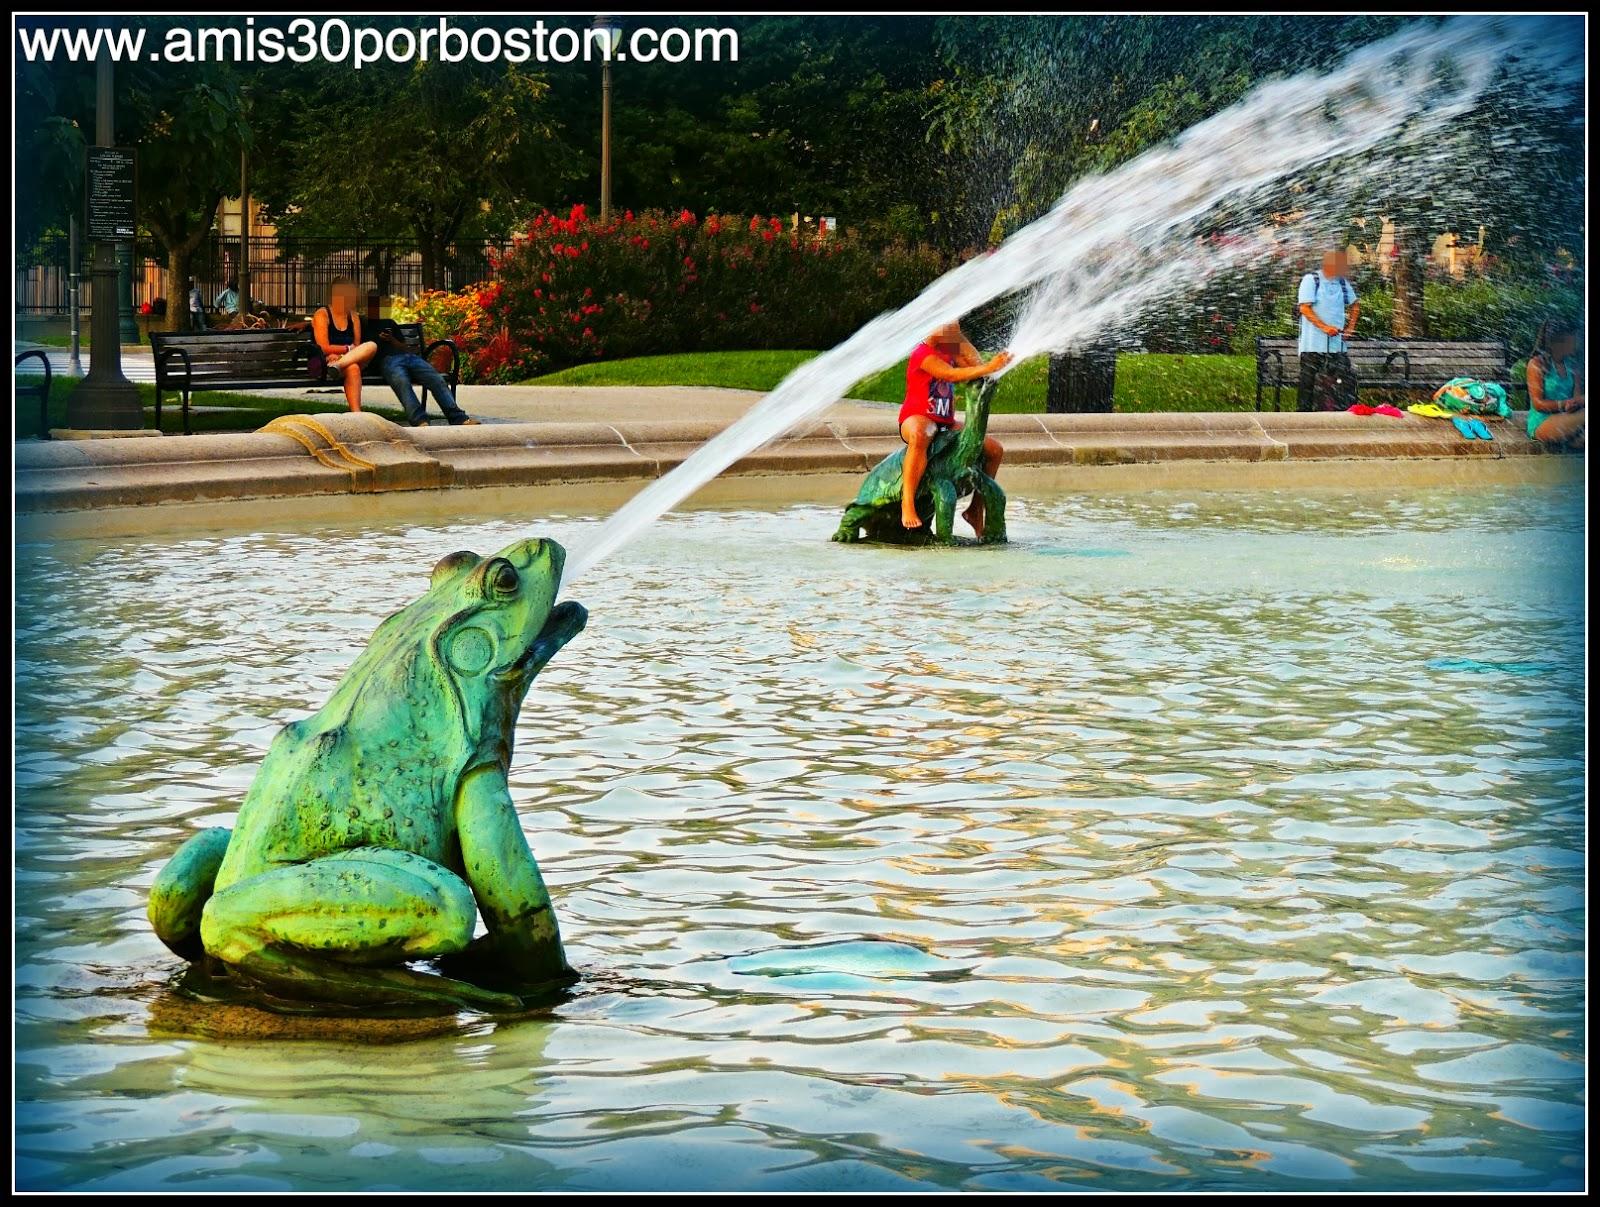 Filadelfia: Swann Memorial Fountain